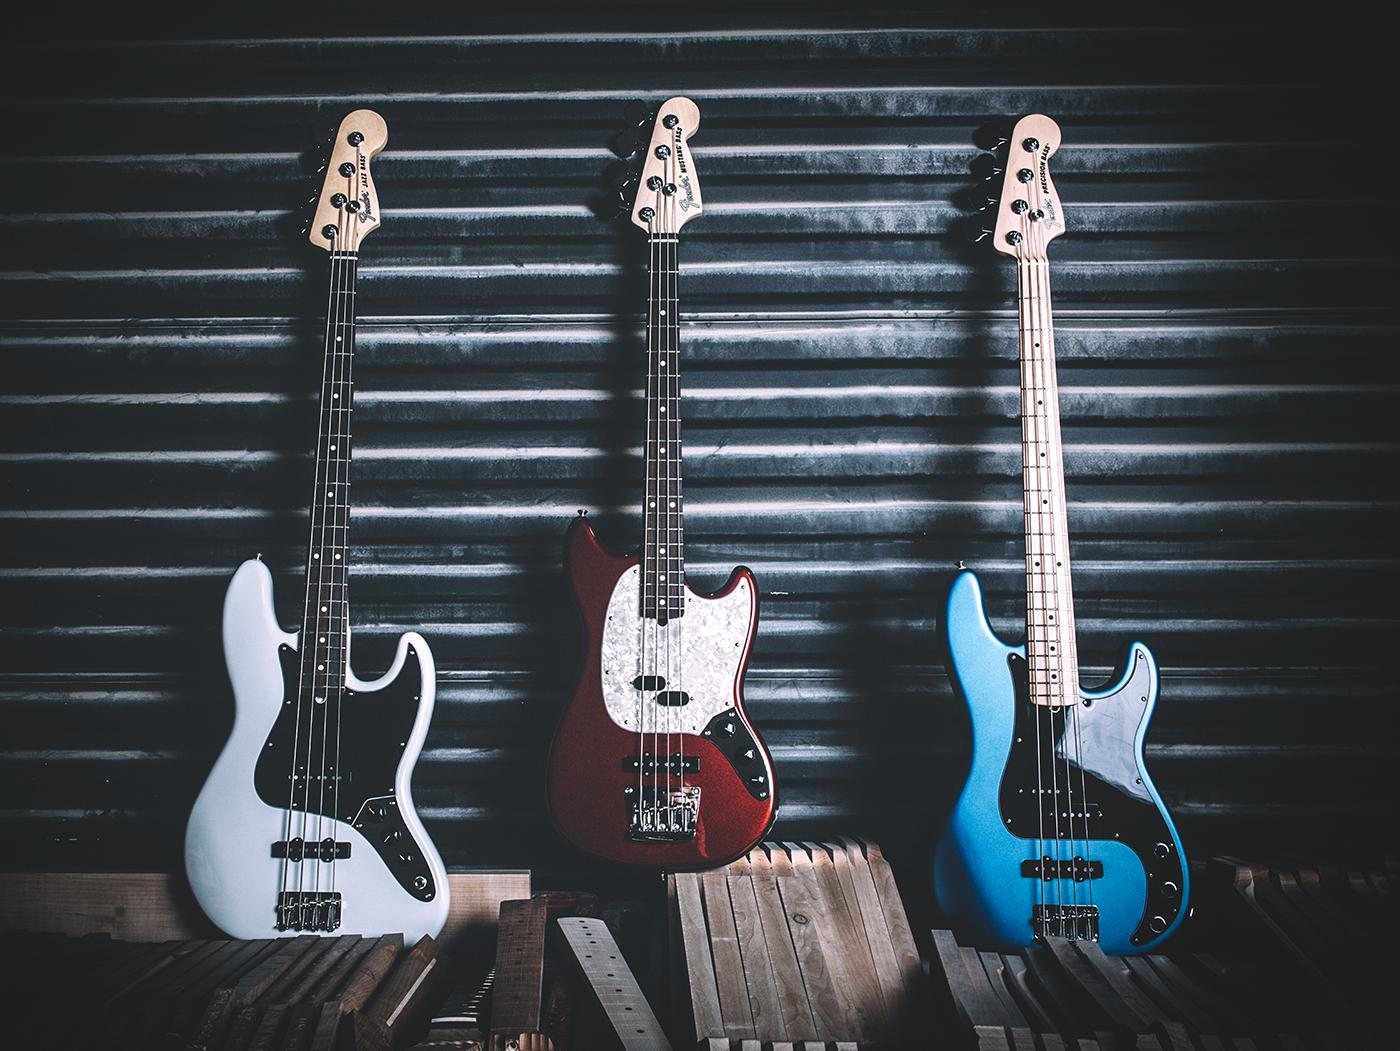 The American Performer basses Fender